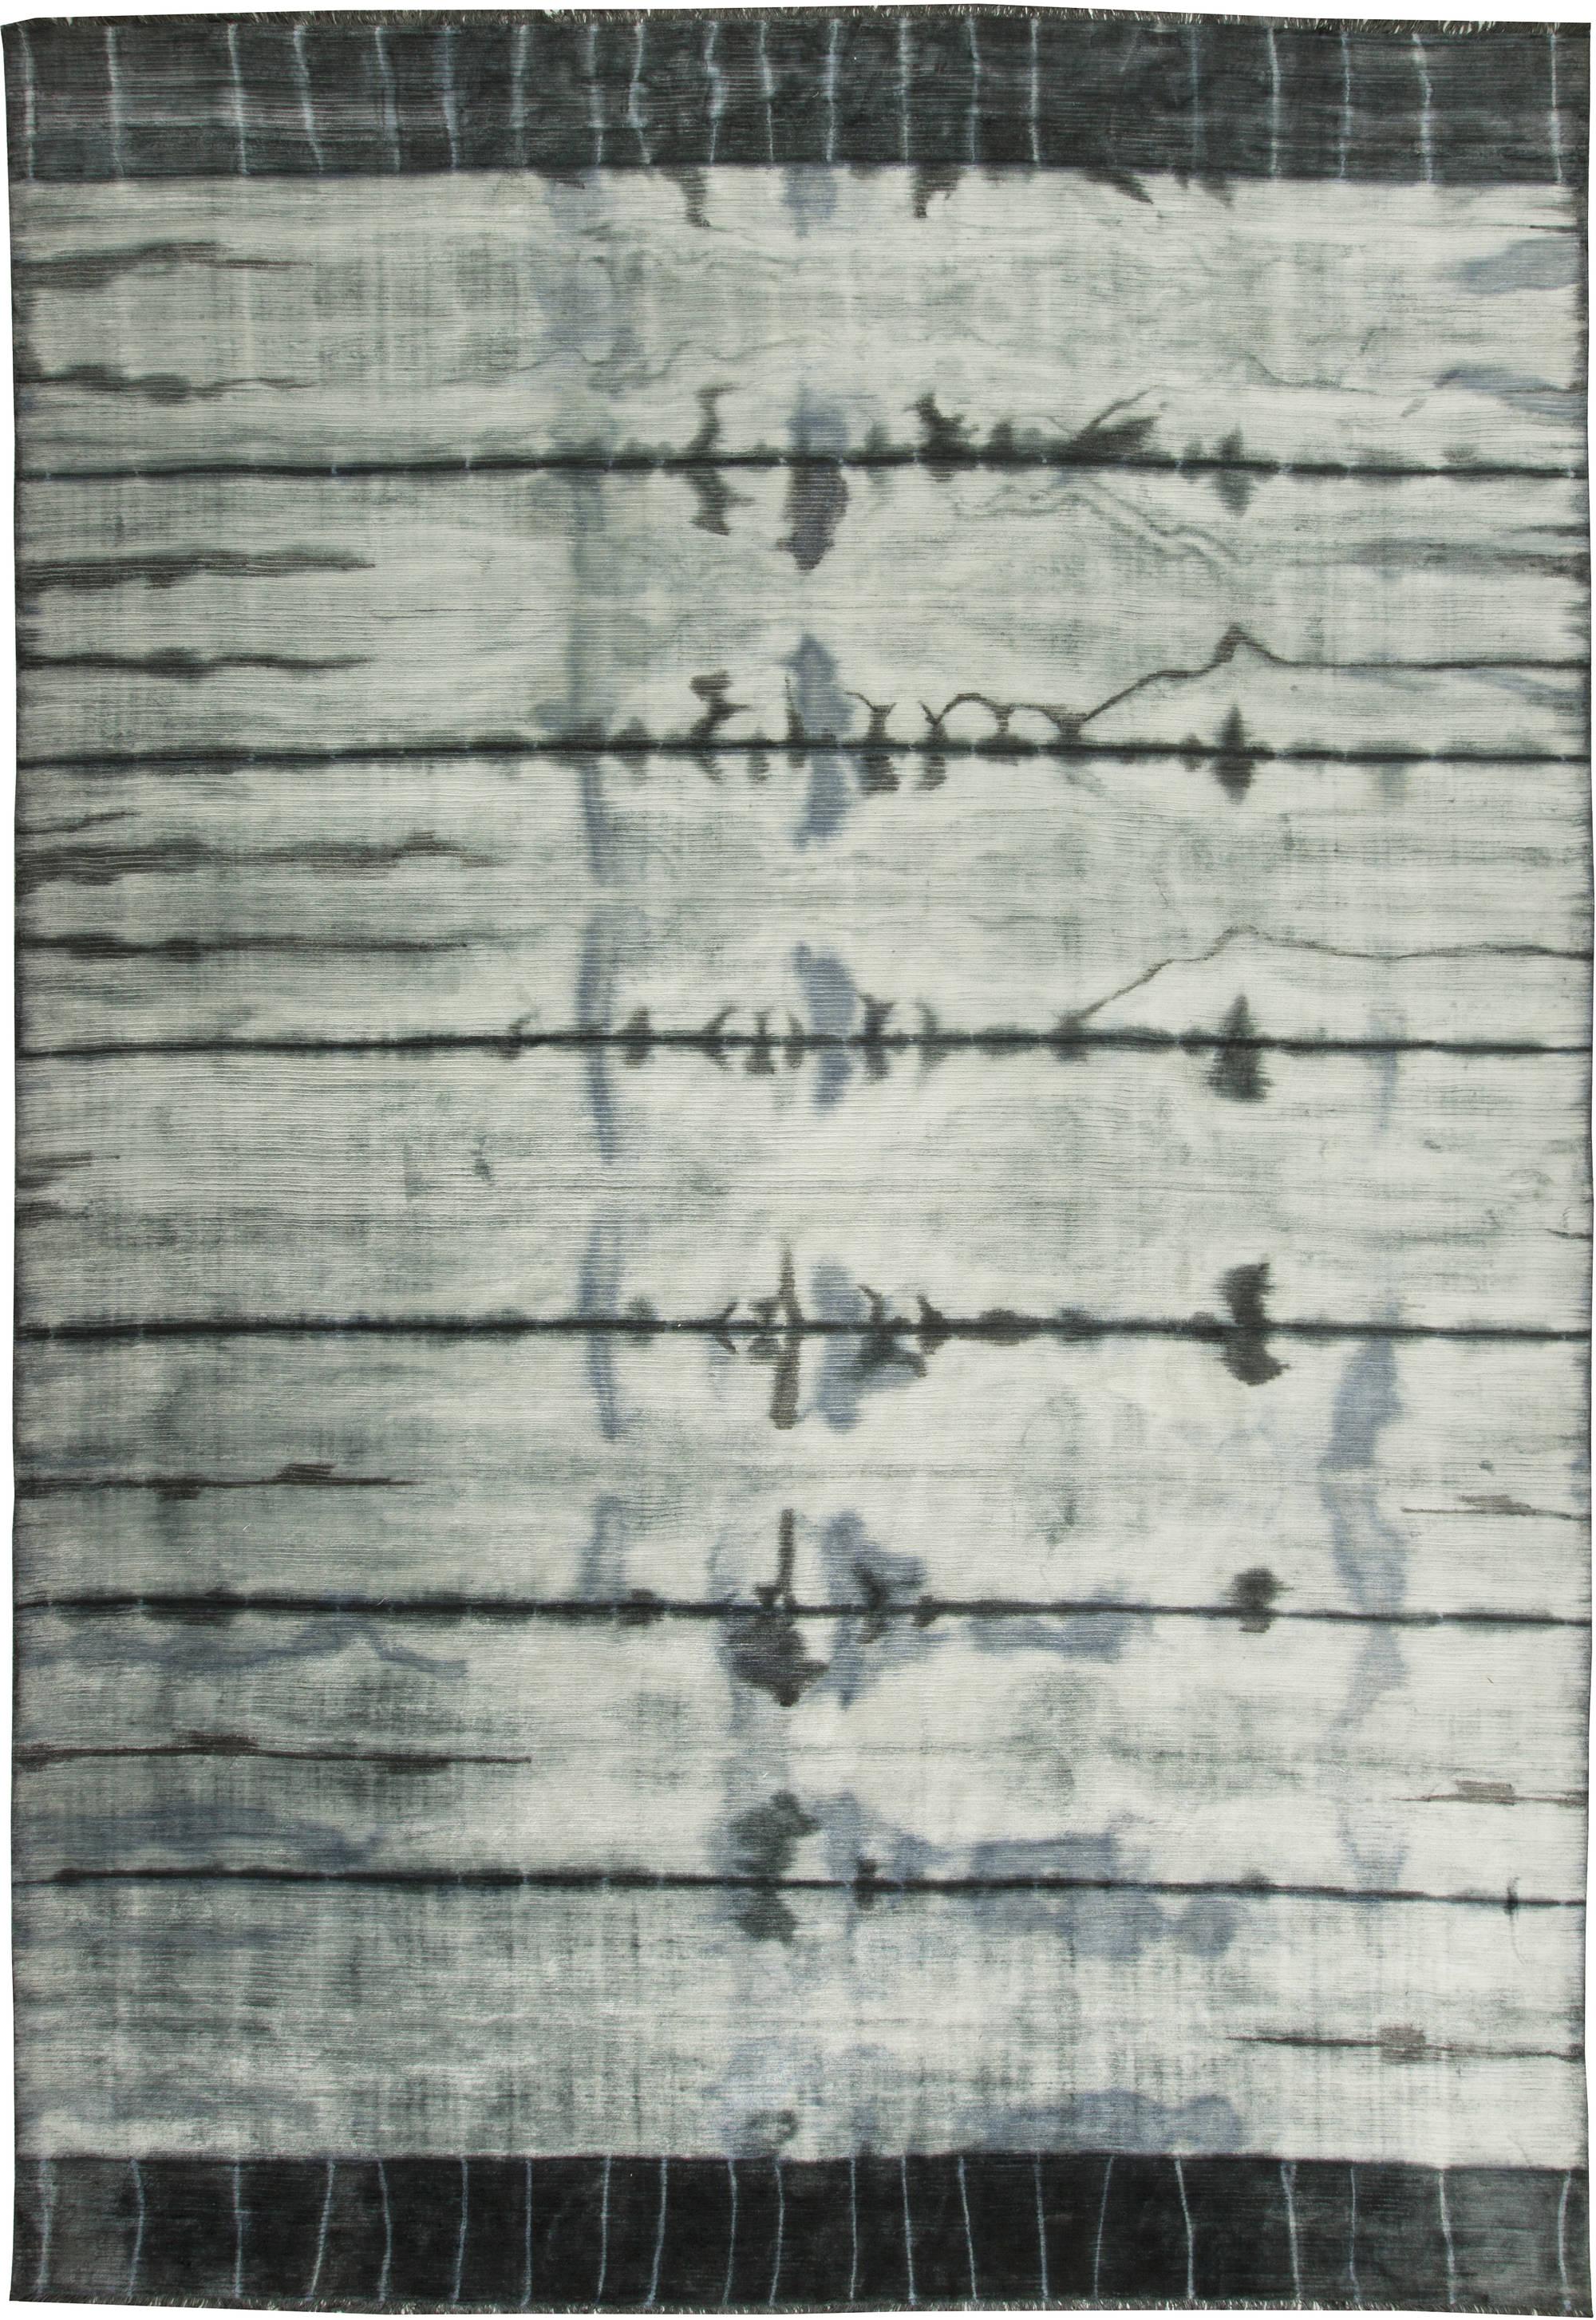 contemporary carpets mandala contemporary carpet n10849. arrow down  47161db02bae4ef92bdede423862e8f0c2b91f81311572b5a8bb90eef3001a34 CVKFLXQ